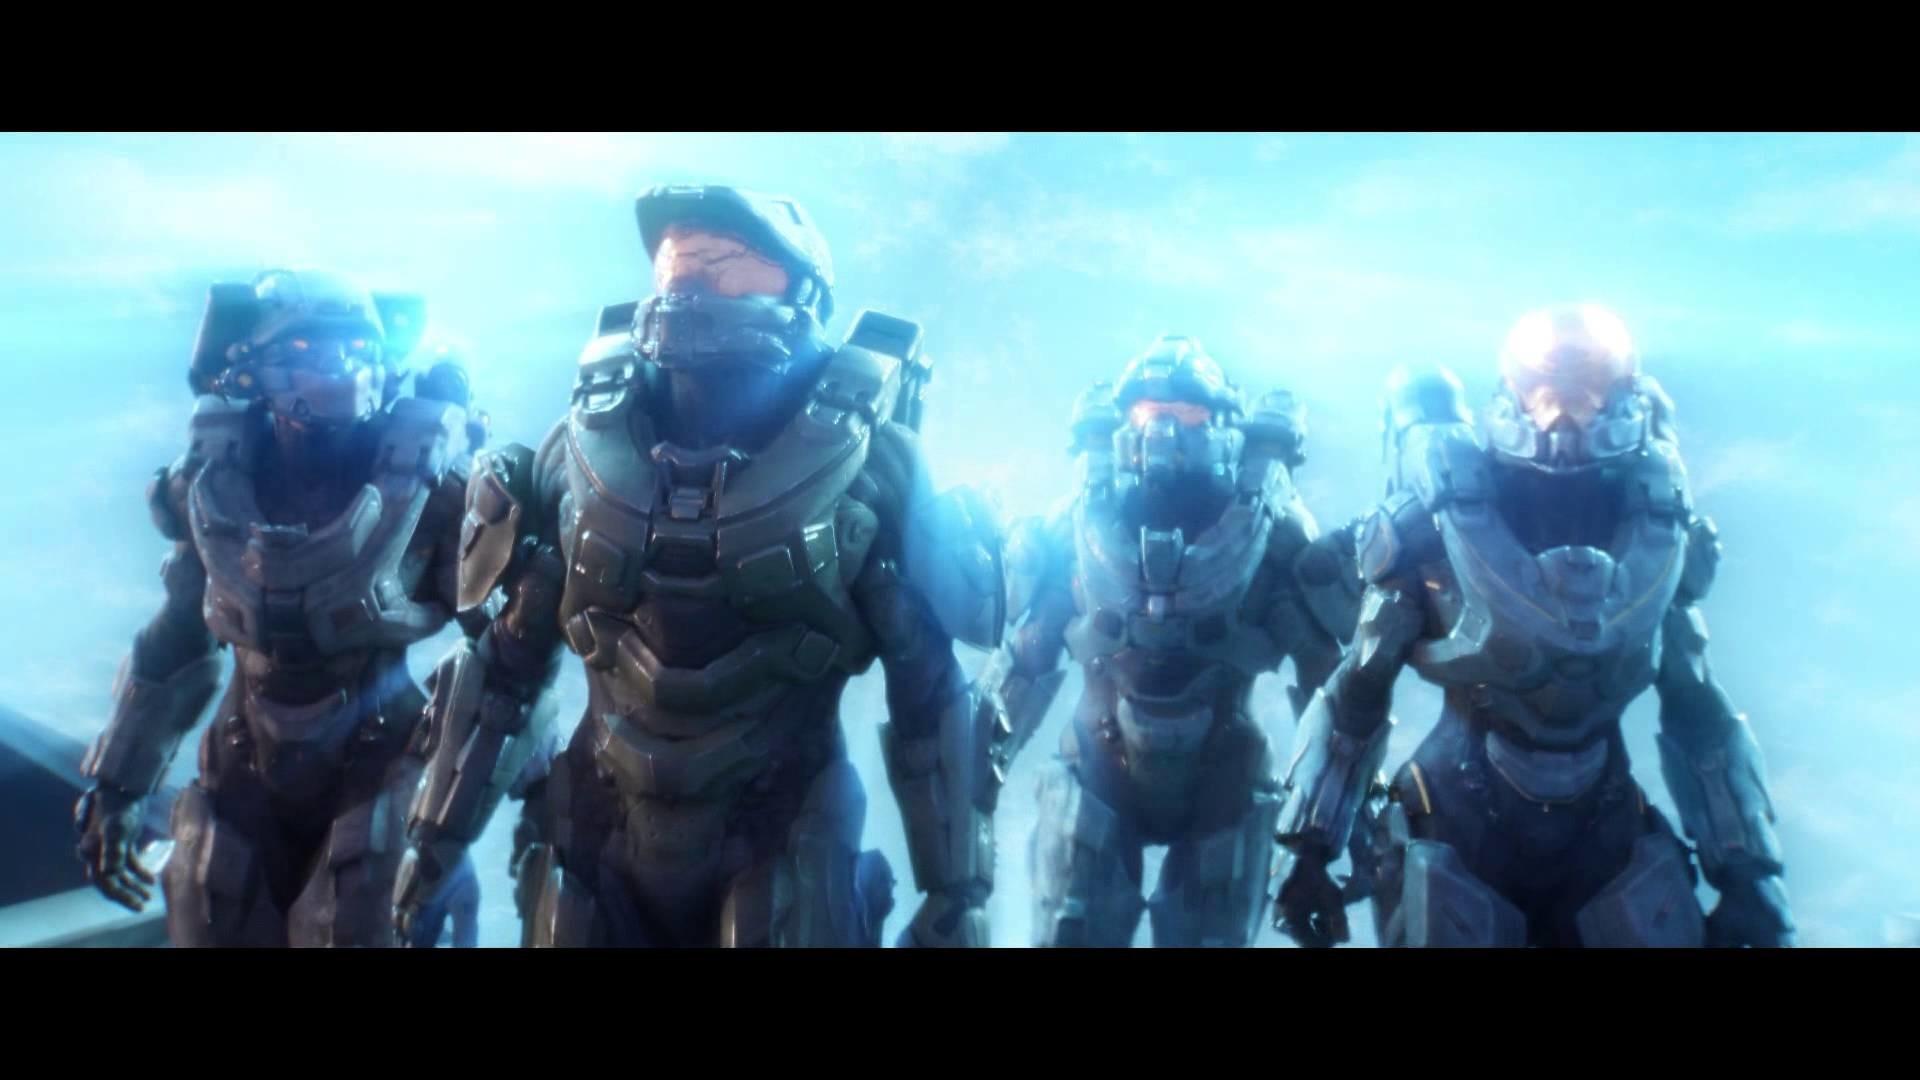 Halo 5: Guardians – Mission 15: Fireteam Osiris Saves Masterchief & Blue  Team Cutscene Xbox One